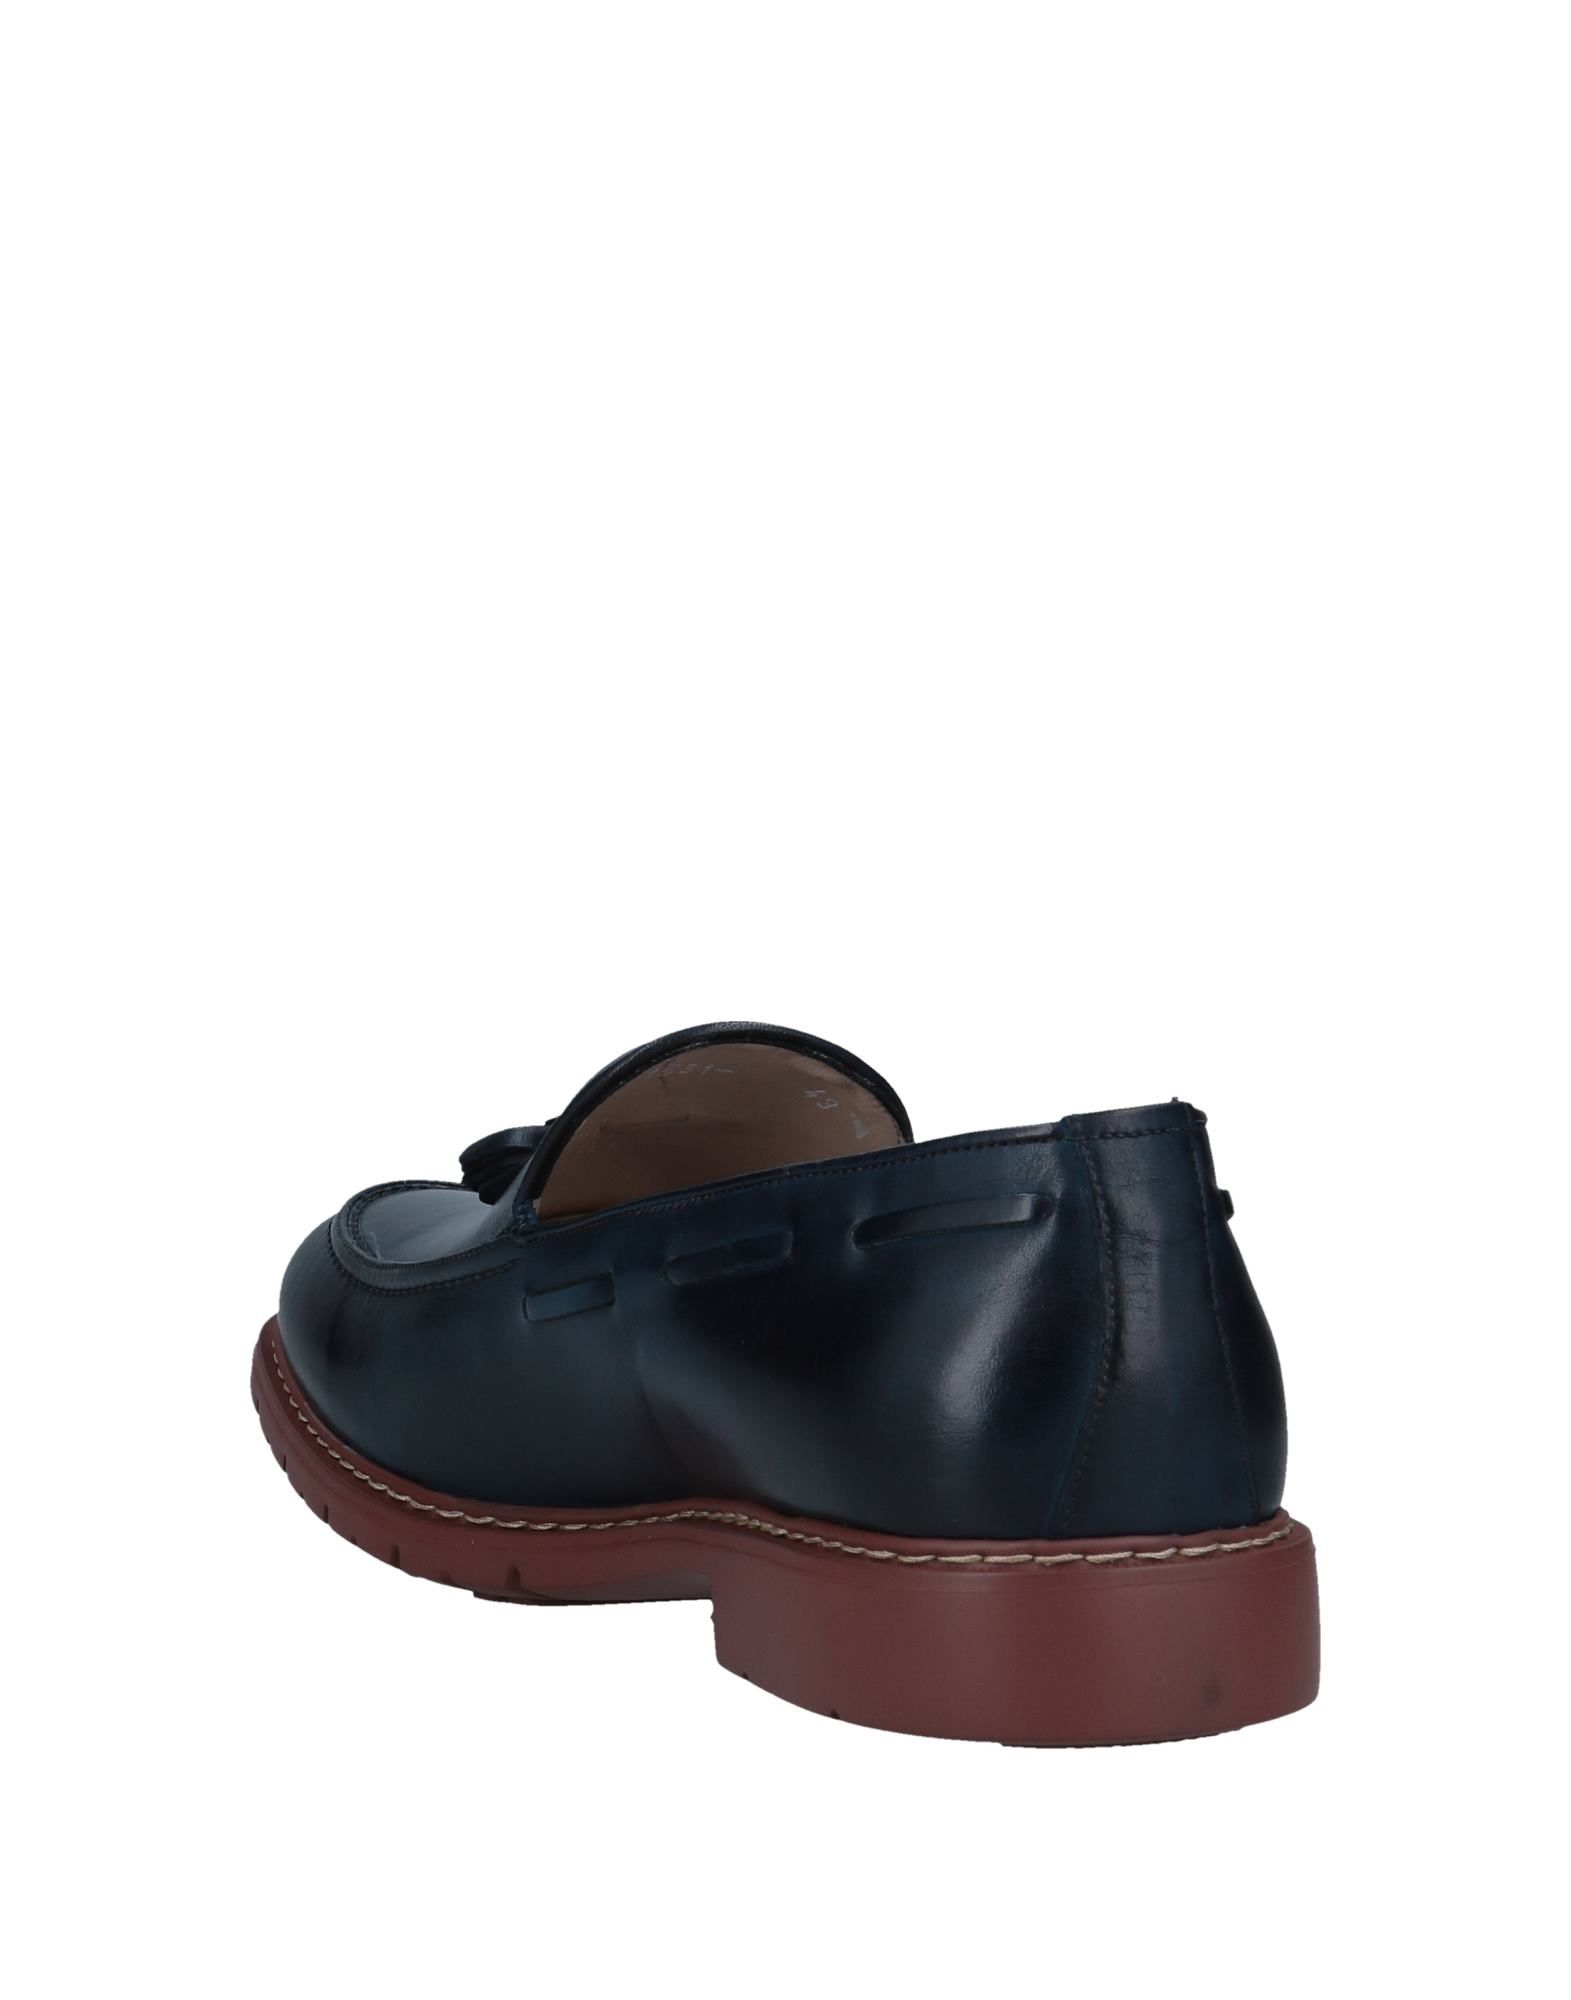 Baldinini Mokassins Gute Herren  11554767HM Gute Mokassins Qualität beliebte Schuhe da59ca